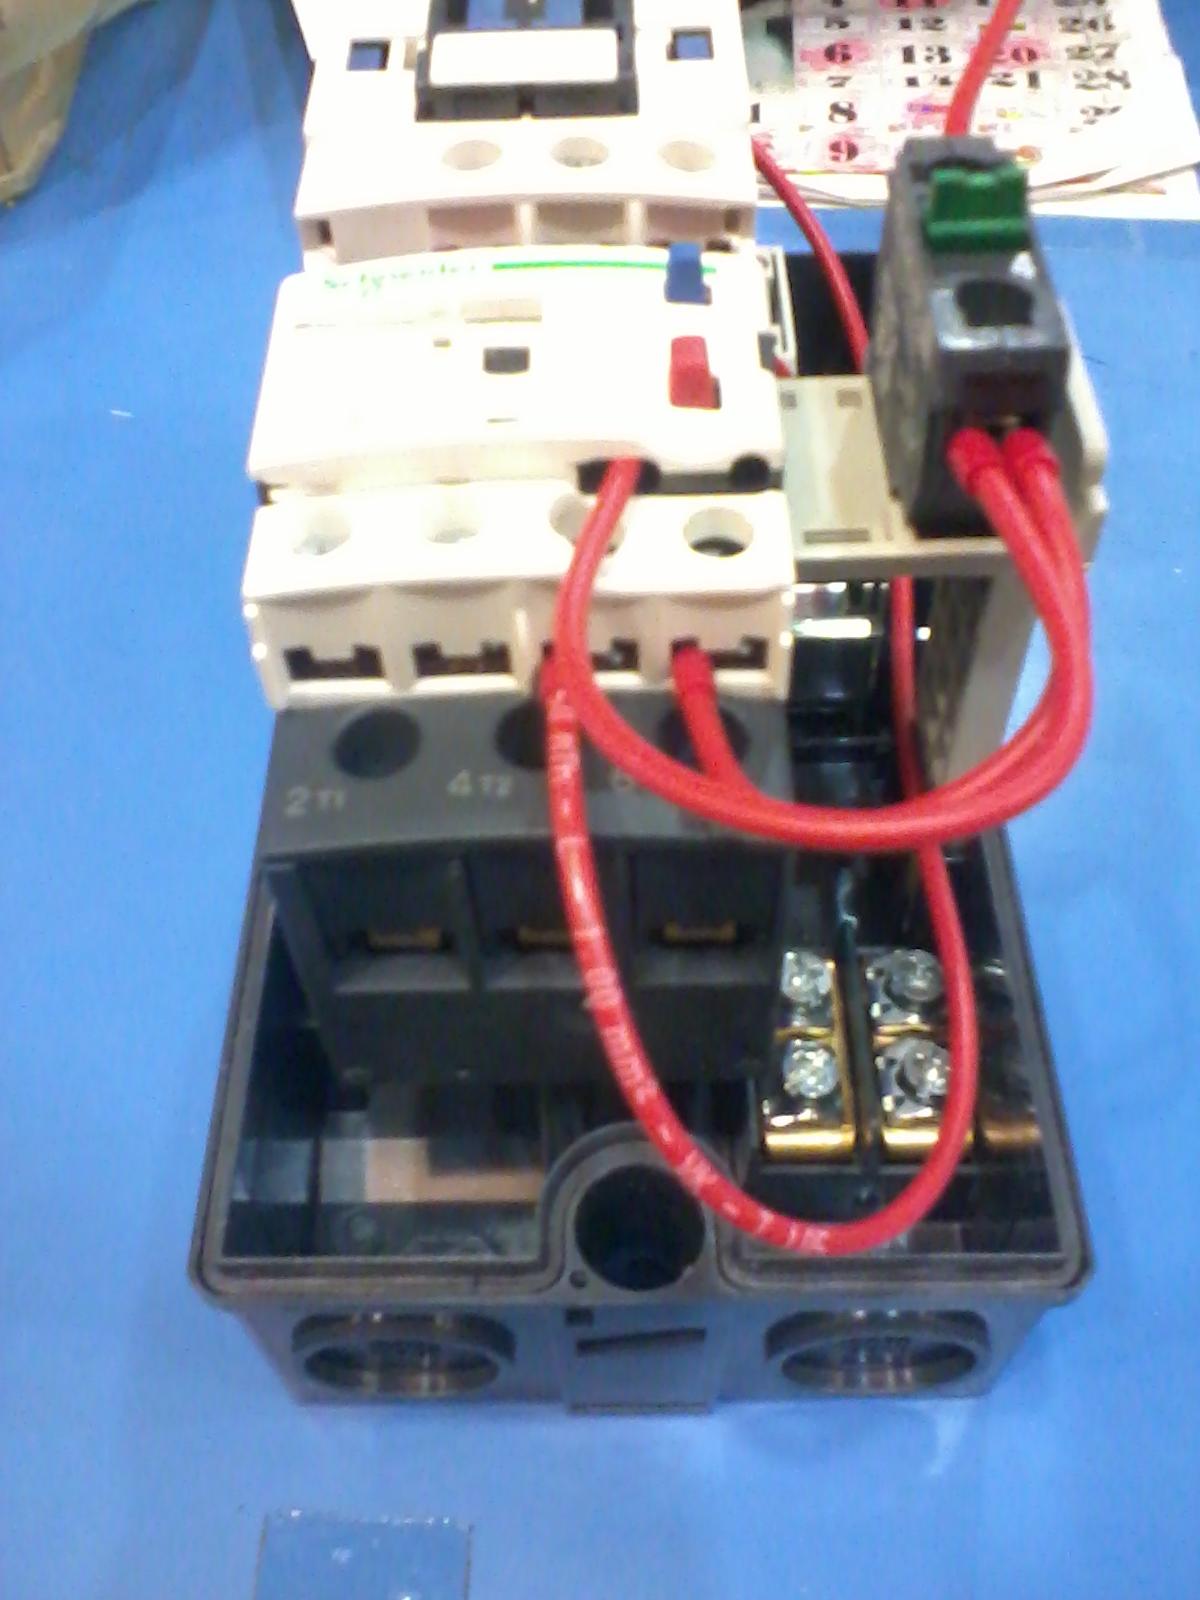 Dol Starter Circuit Diagram 2000 Ford F250 Alternator Wiring Vinca 39s Blog